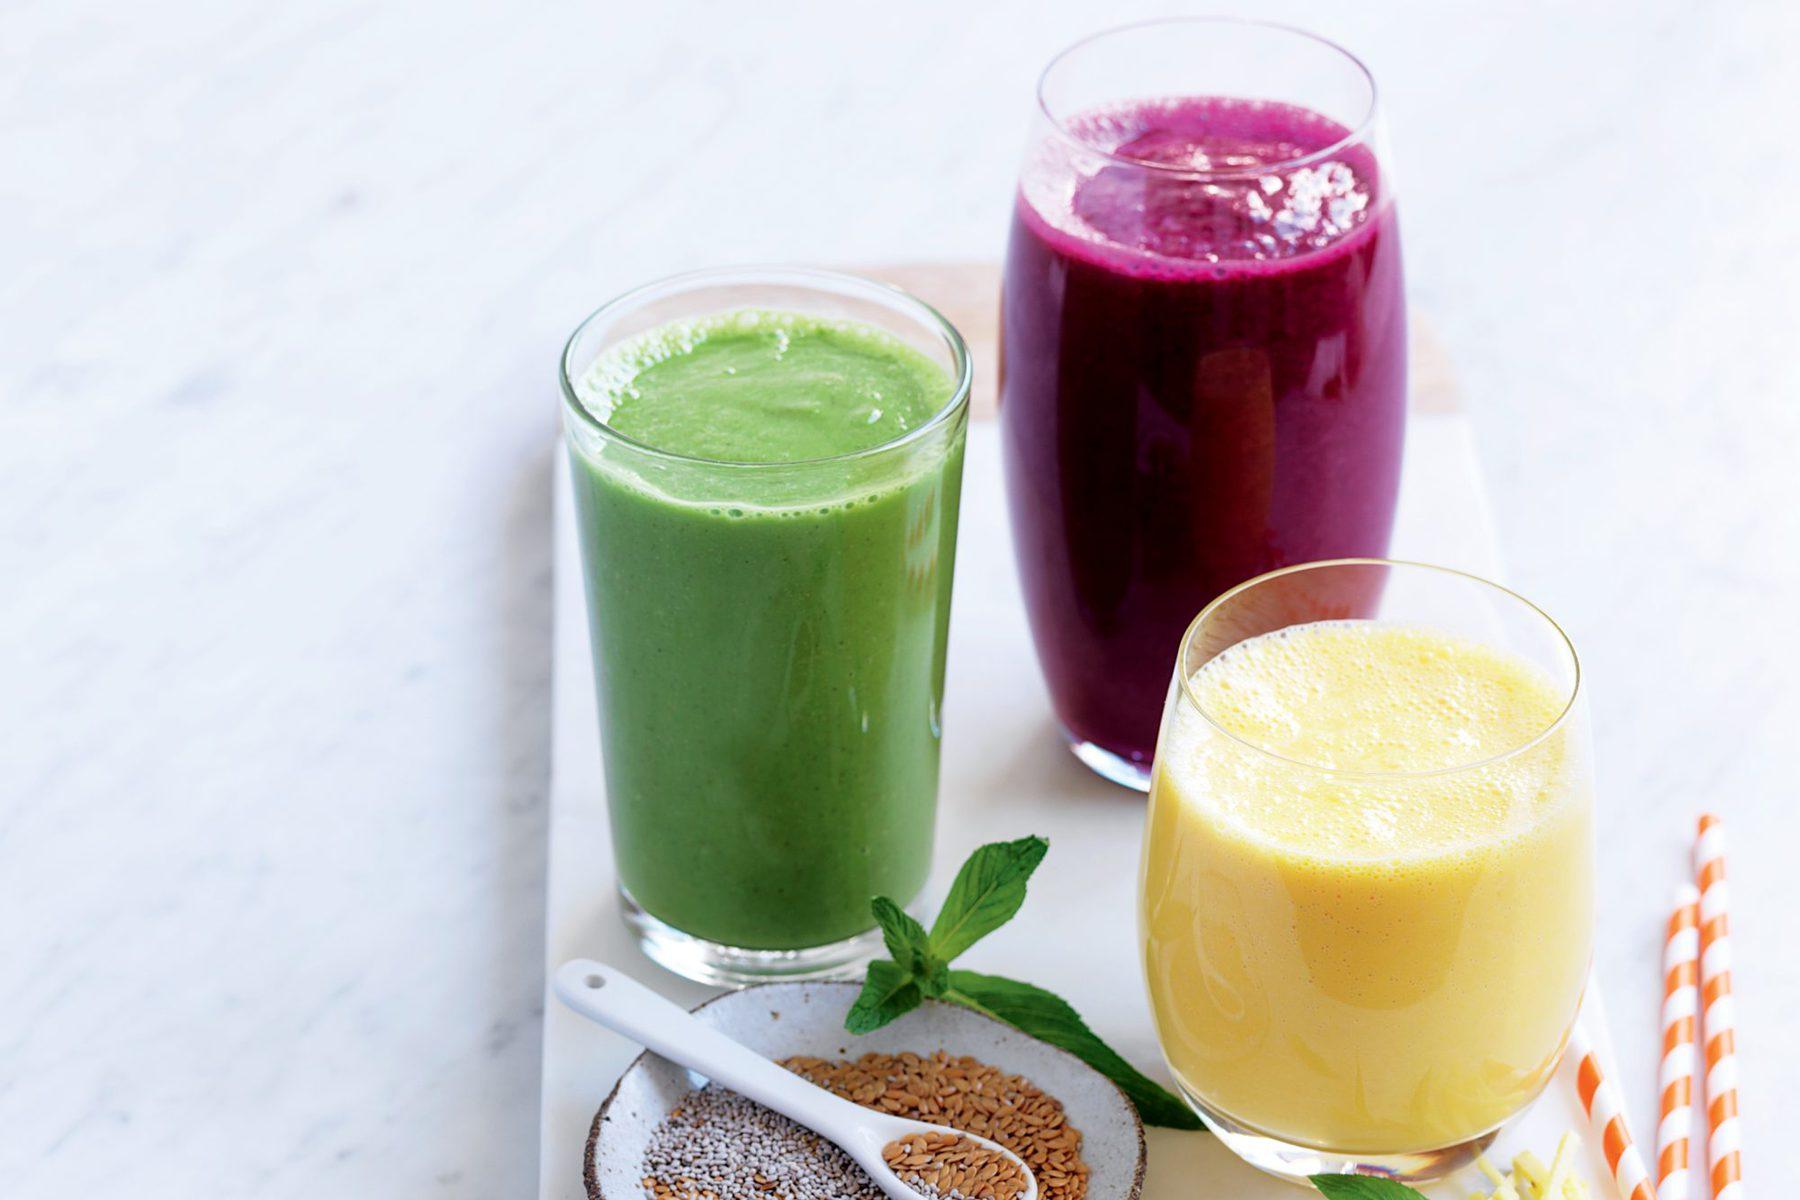 Purple berry and beet juice